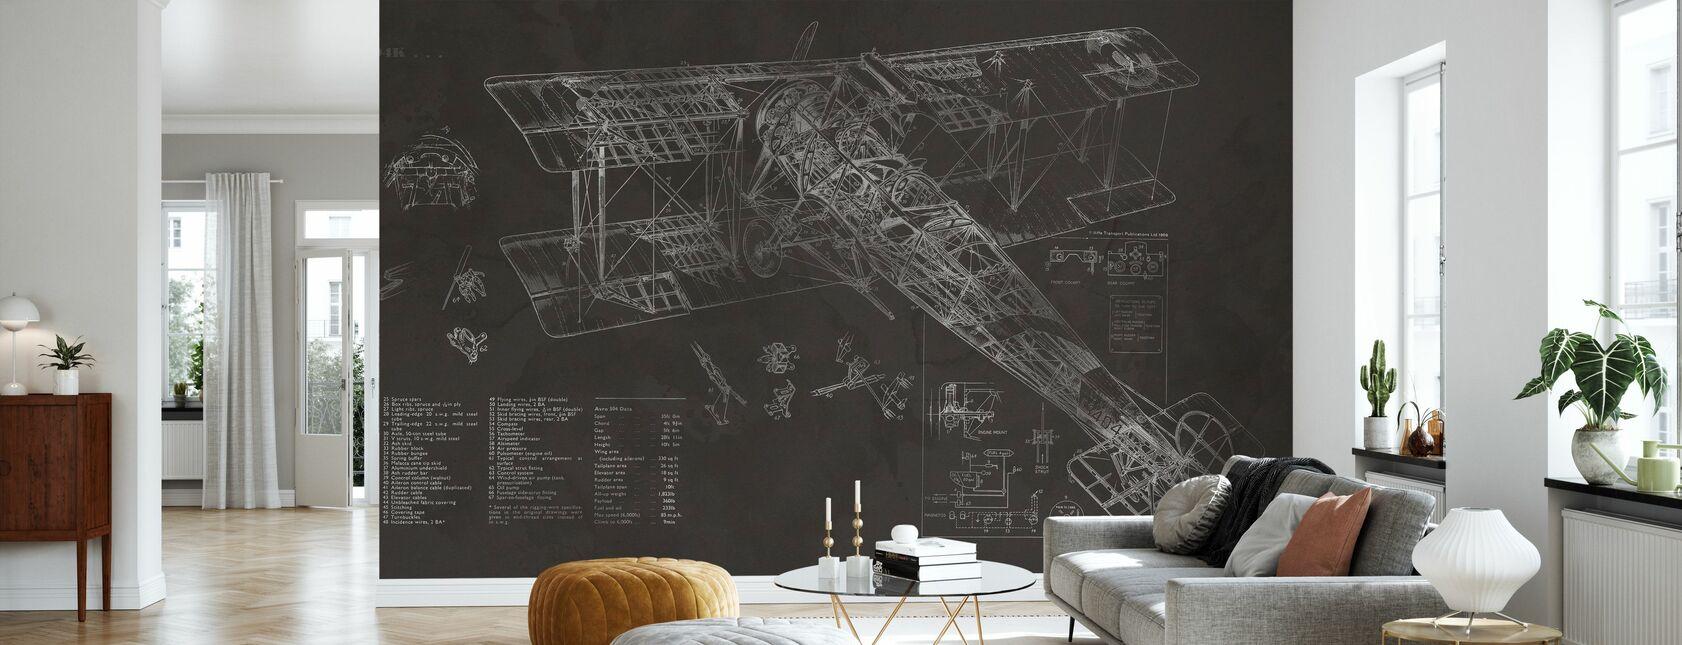 Avro 504K Avion - Noir - Papier peint - Salle à manger